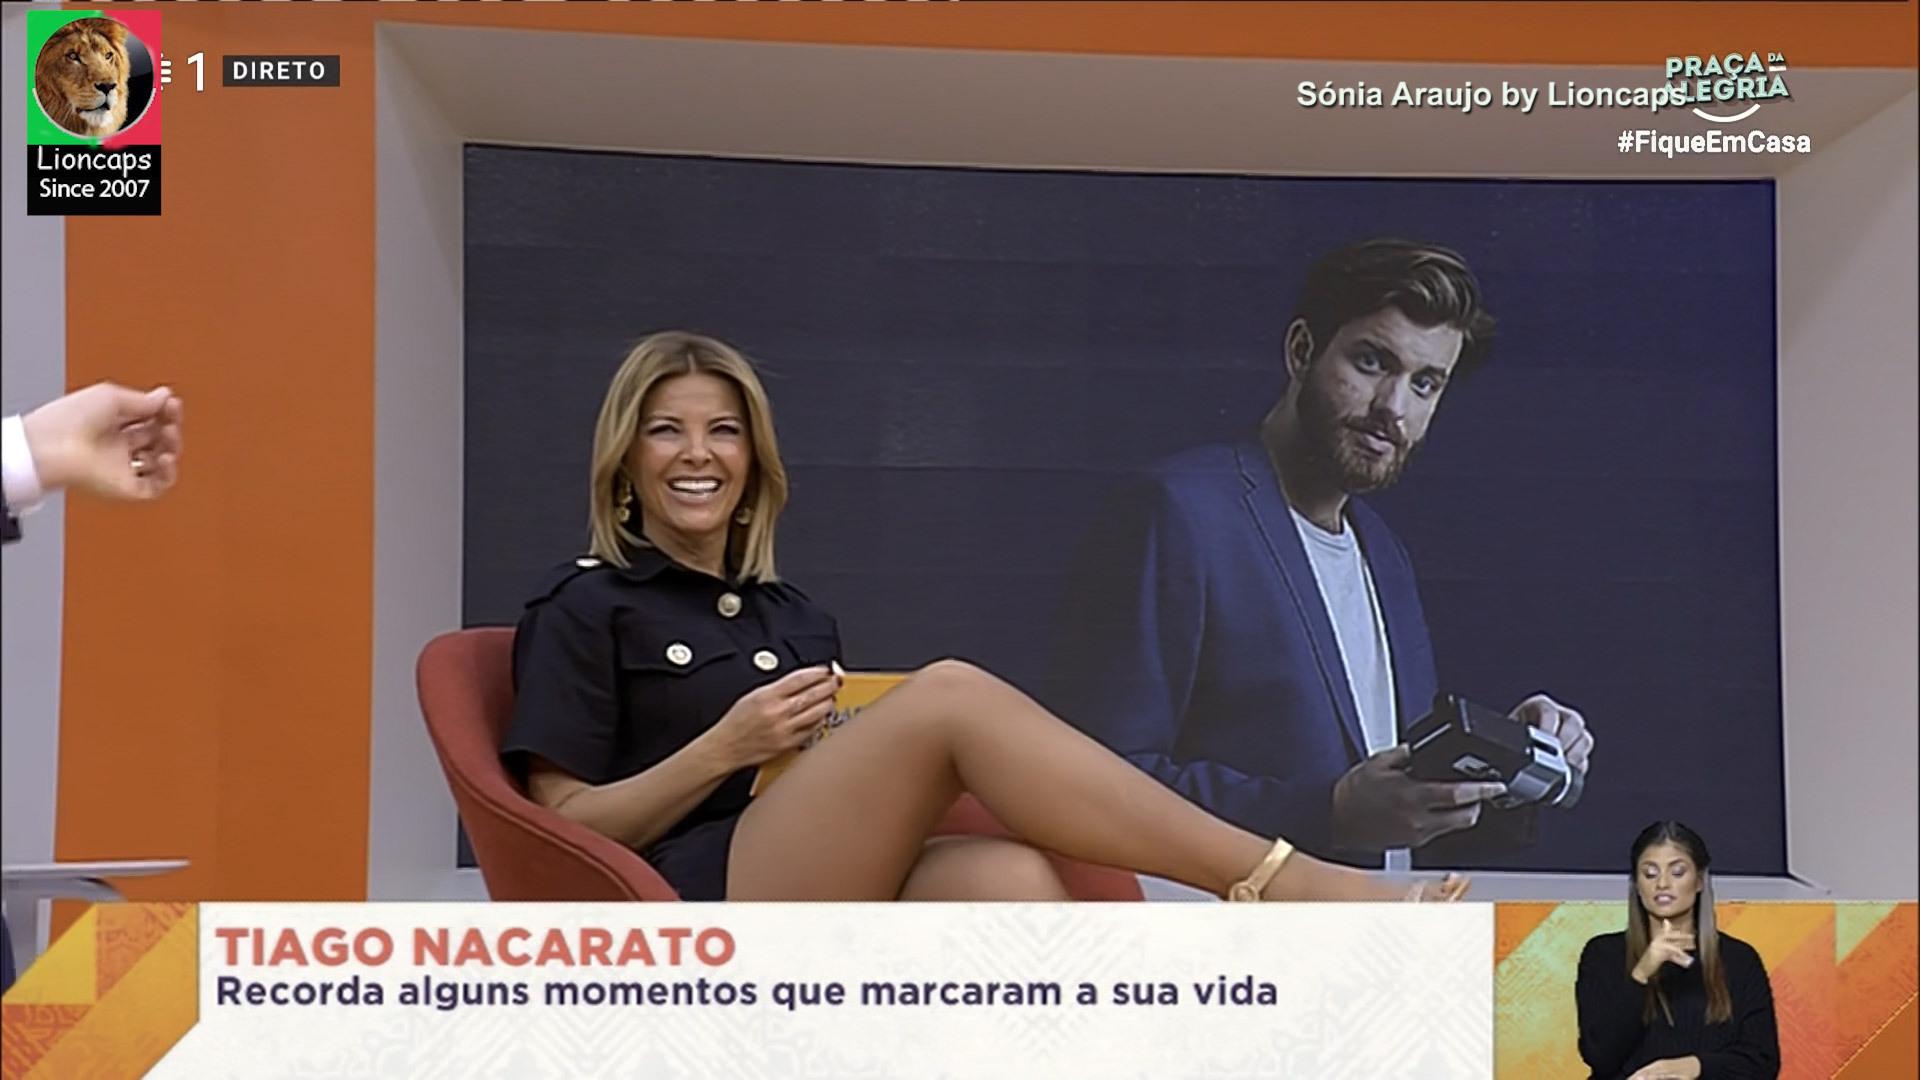 sonia_araujo_praca_lioncaps_11_04_2021 (3).jpg